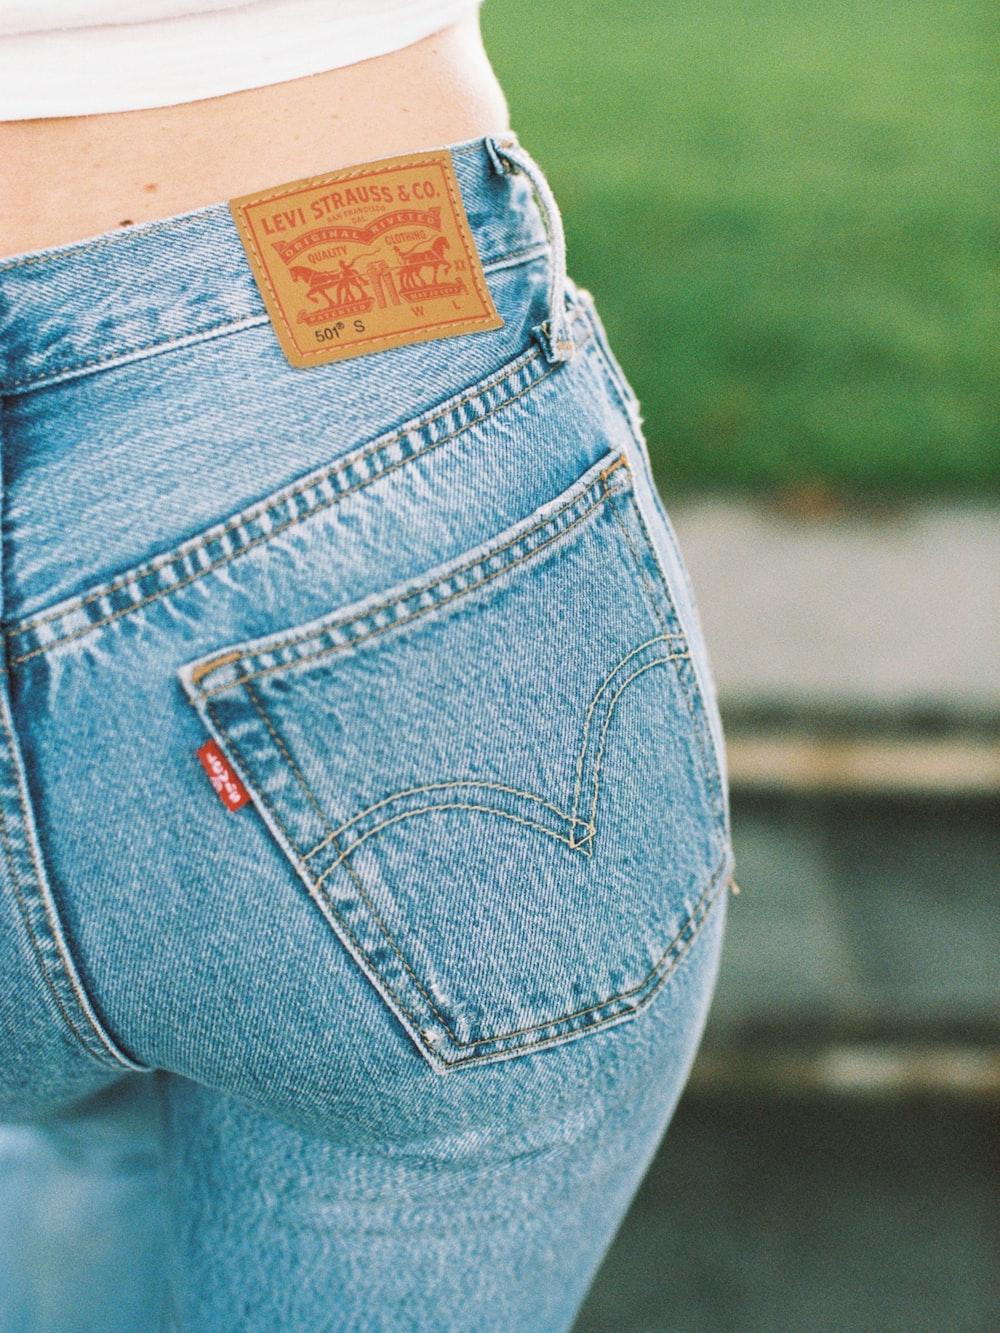 shallow focus photo of person wearing blue Levi denim bottoms